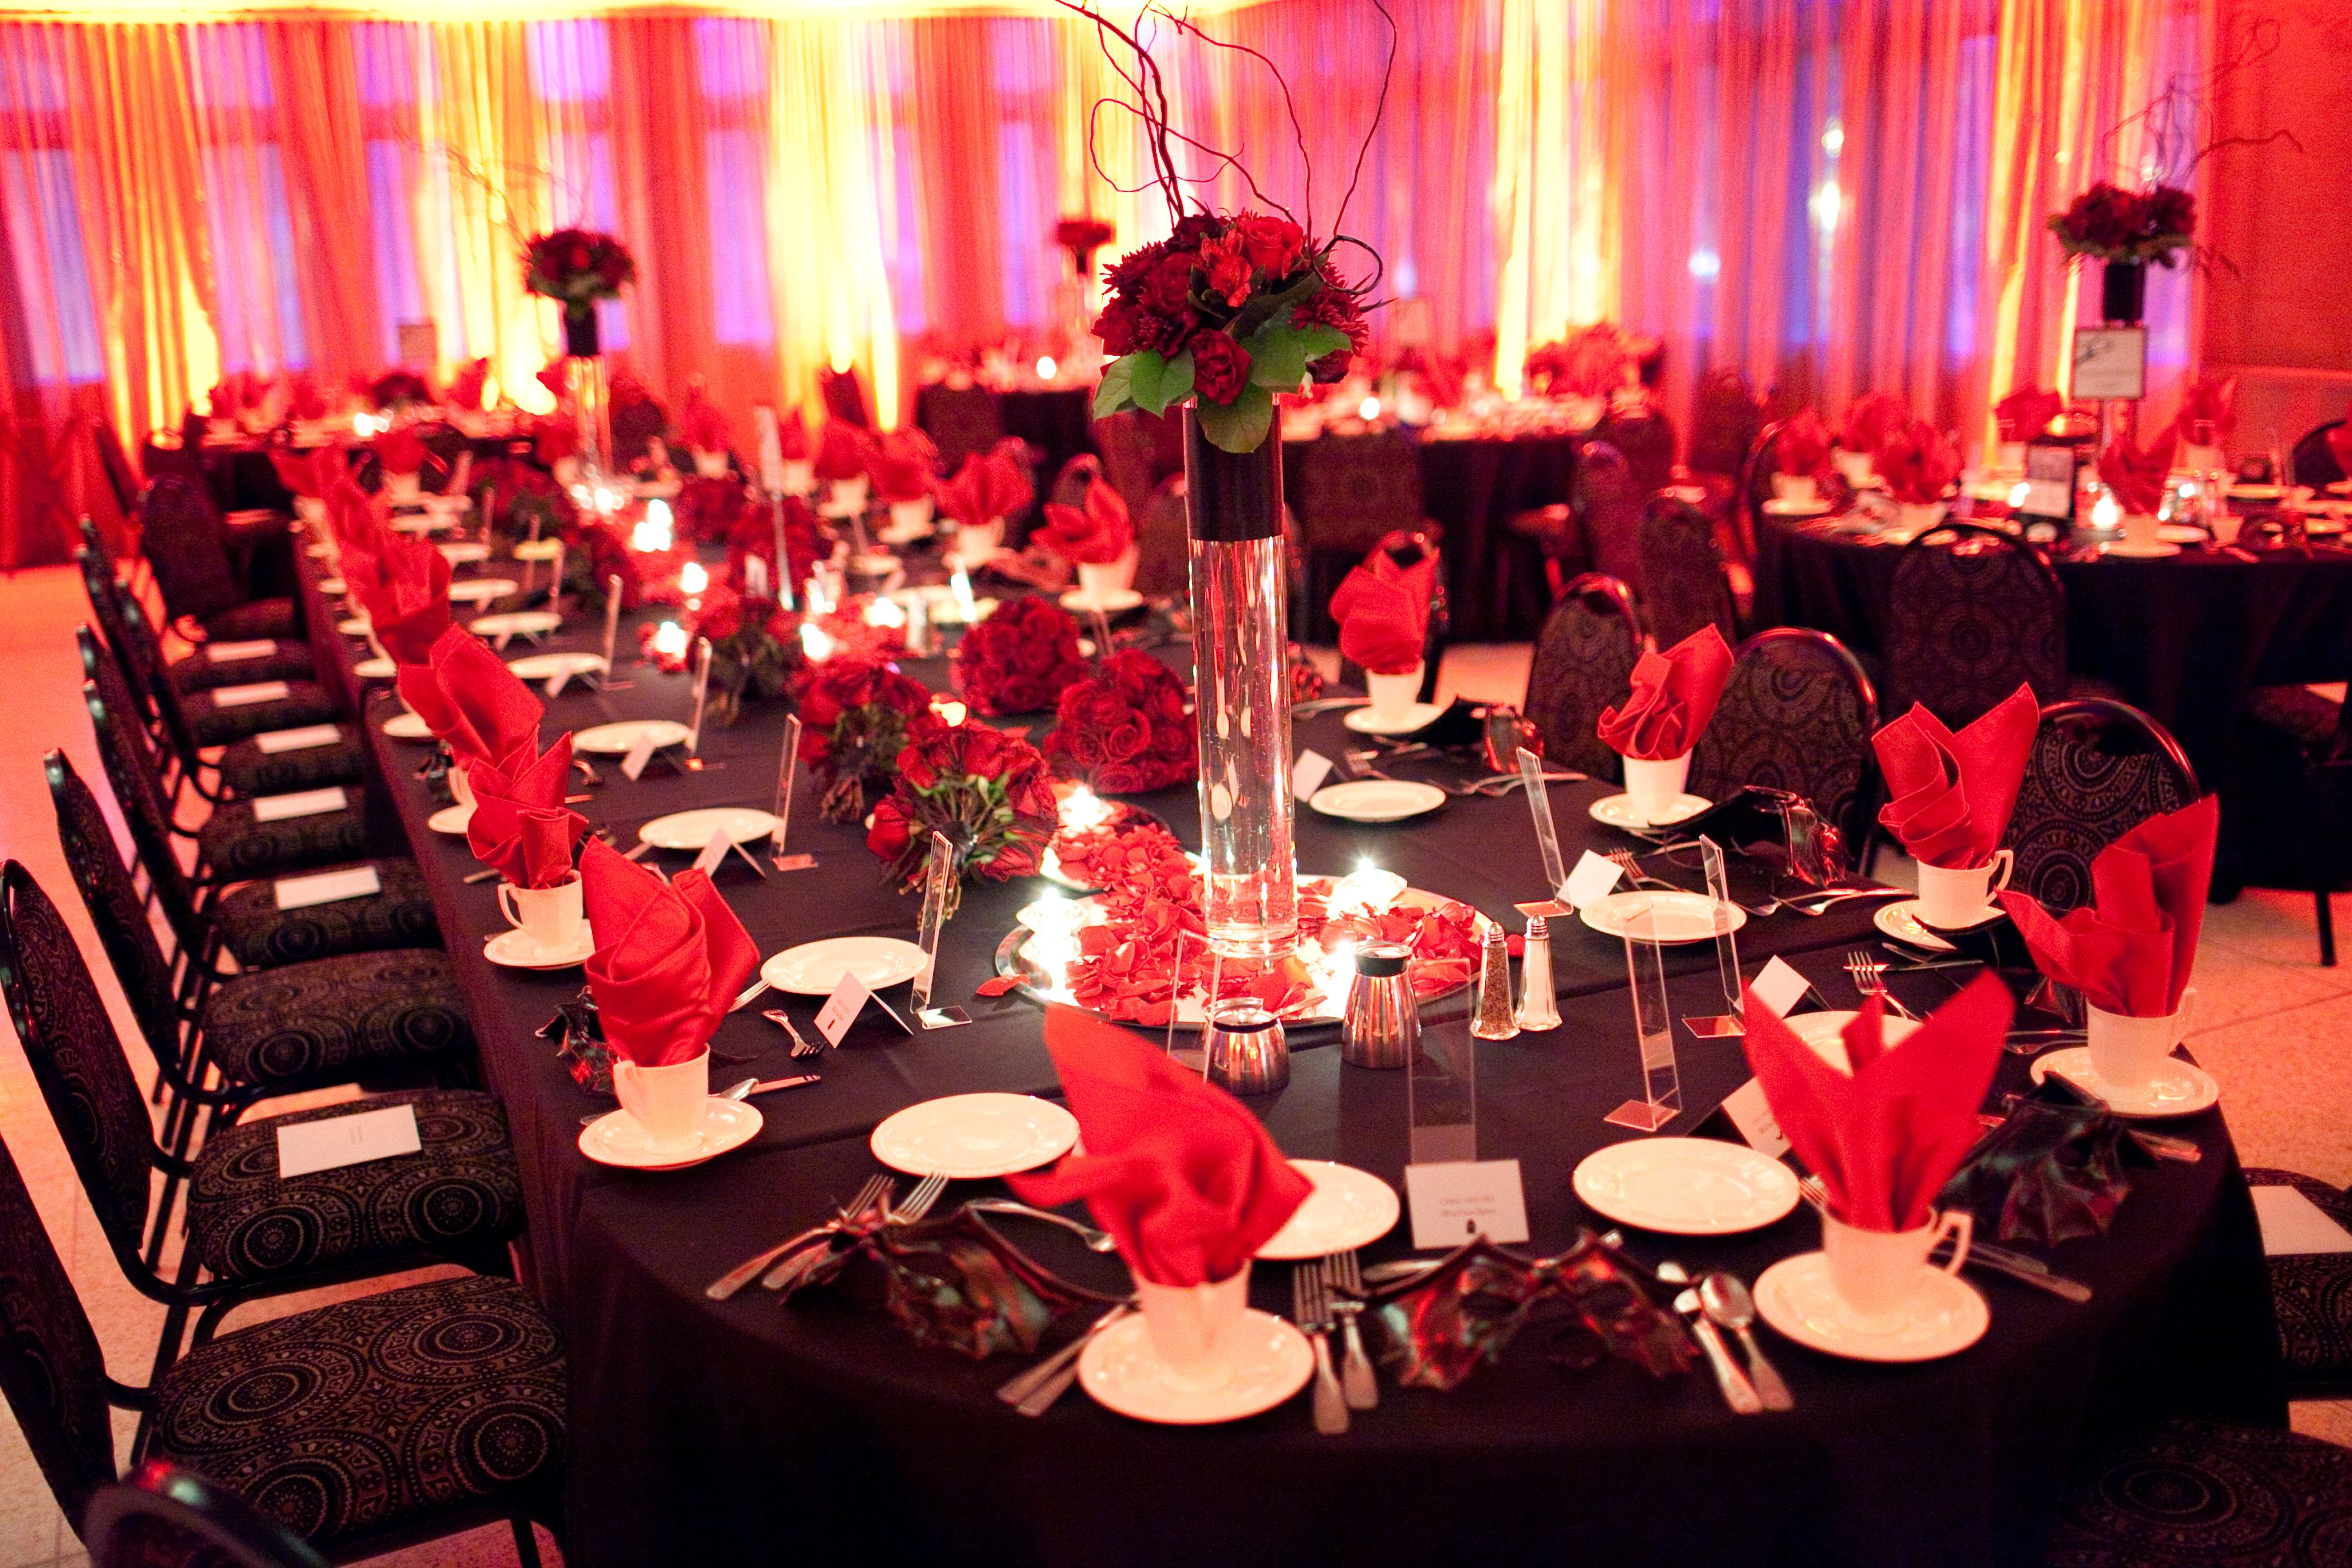 wedding reception restaurants mn%0A Black and Red theme decor  Photo by Randi   minnesota  wedding  decor